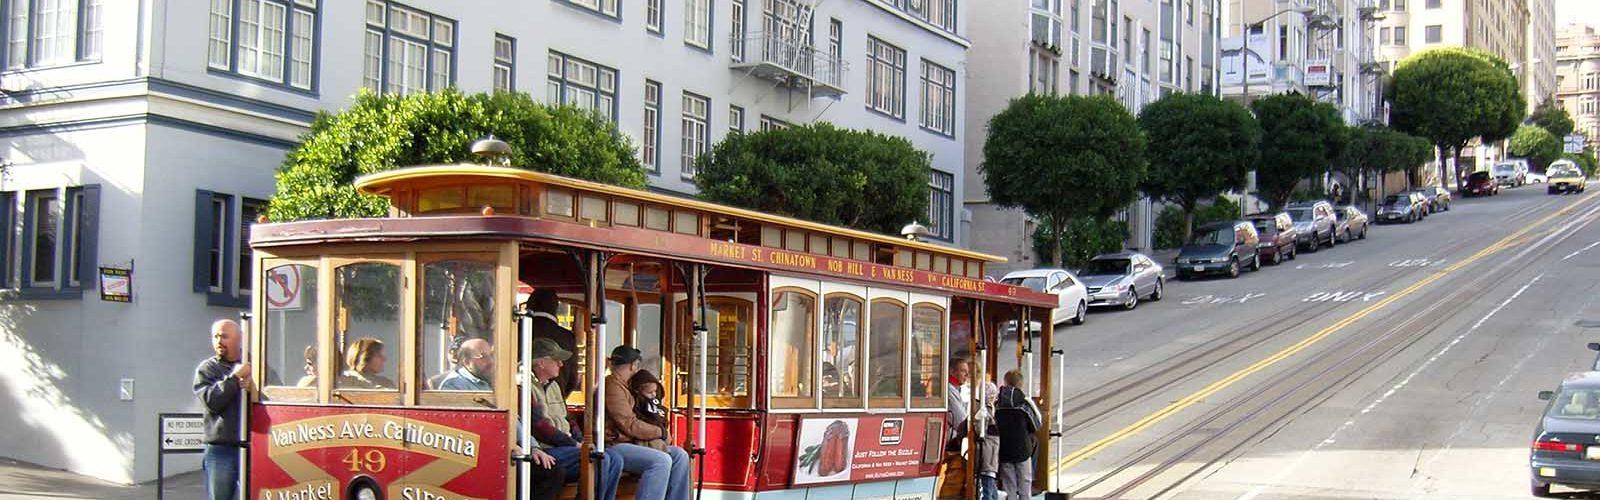 balade-cable-car-tramway-transport-san-francisco-une